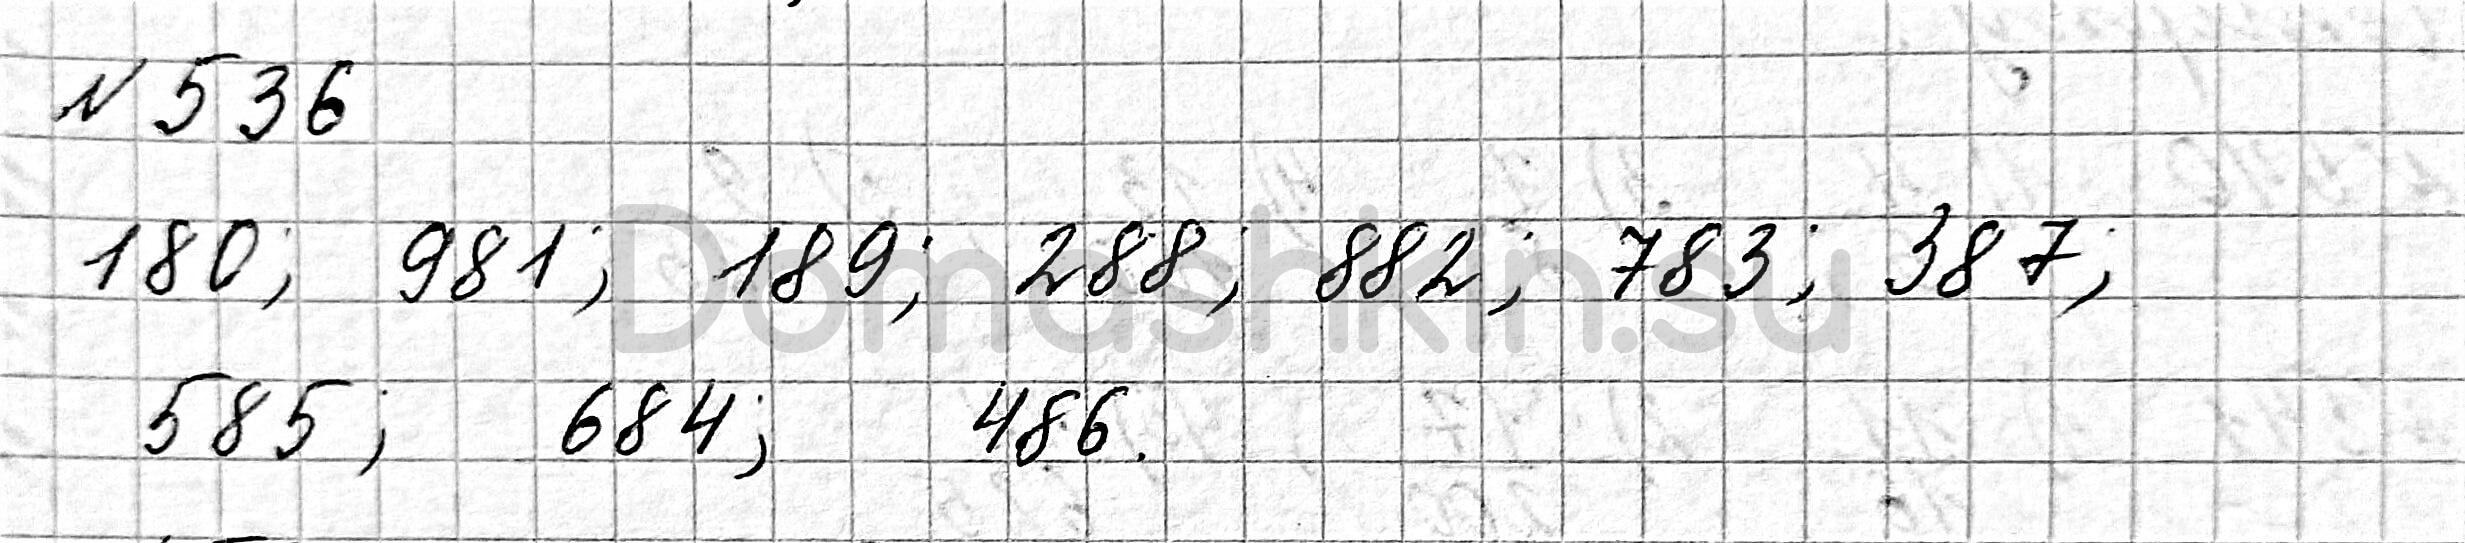 Математика 6 класс учебник Мерзляк номер 536 решение